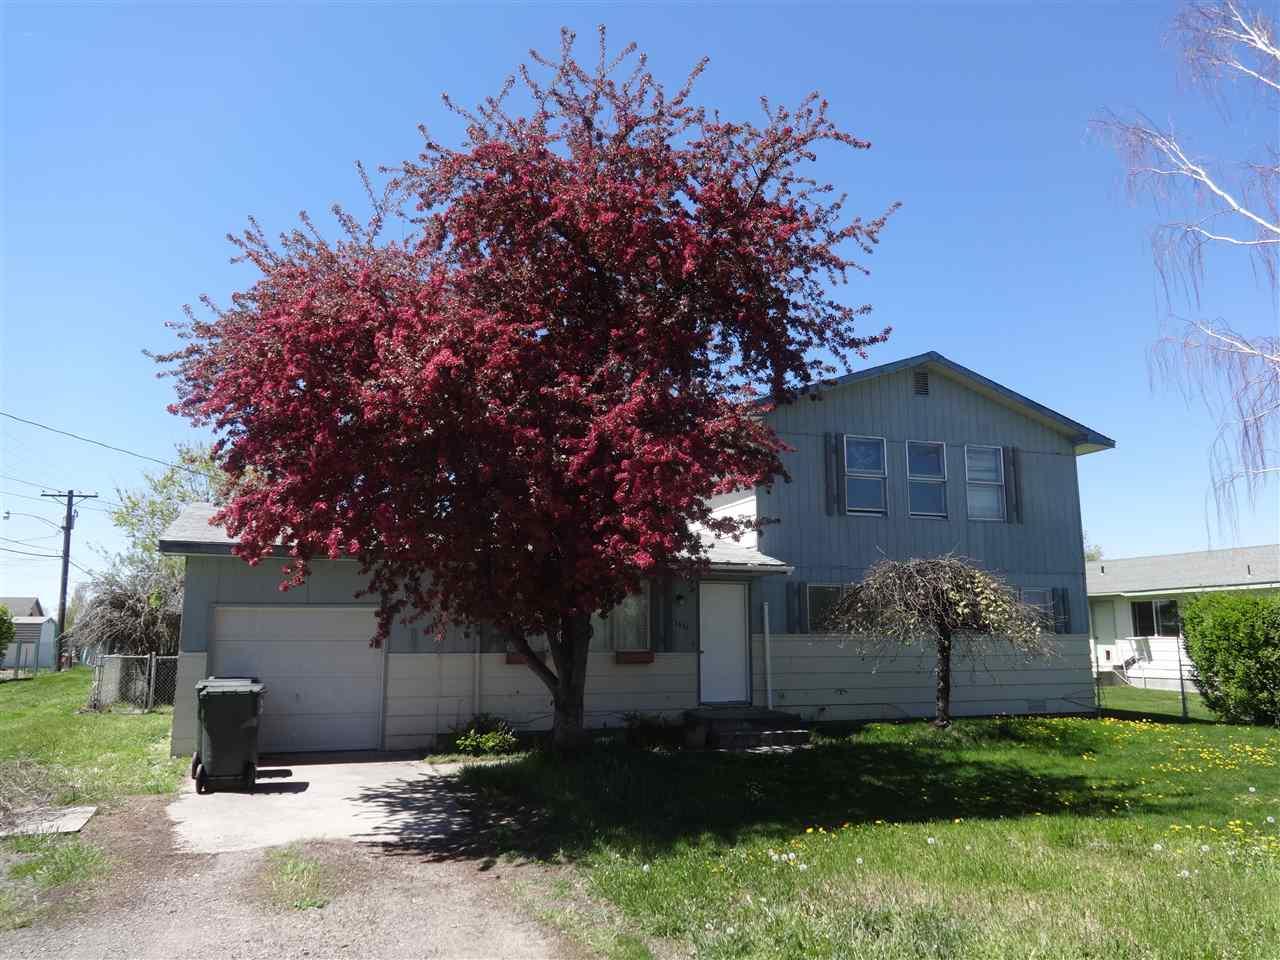 Single Family Home for Sale at 1631 R Street 1631 R Street Heyburn, Idaho 83336